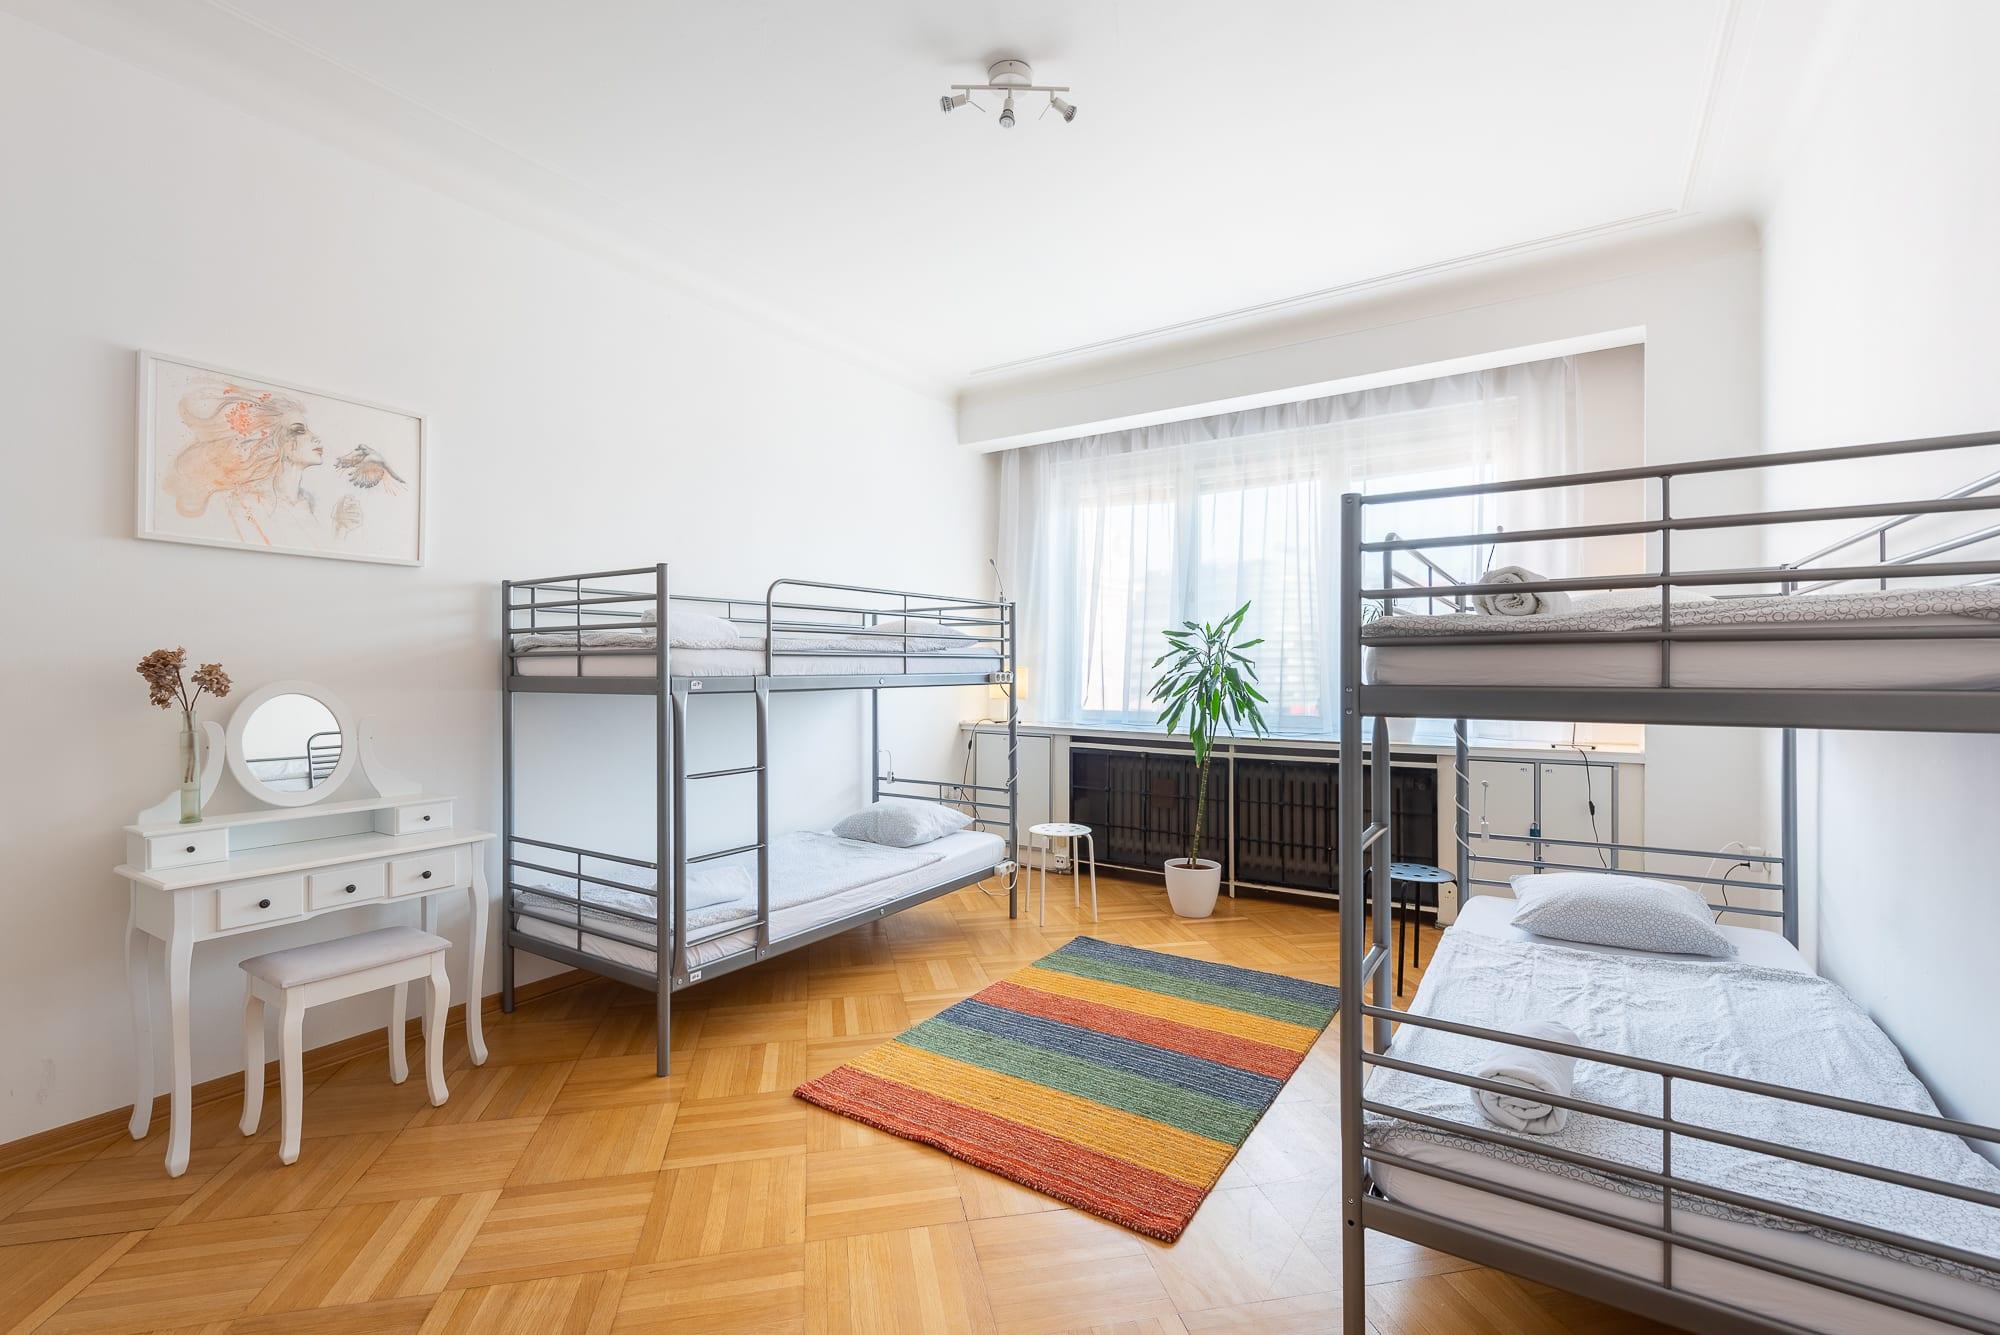 HOSTEL - McSleep Hostel Prague